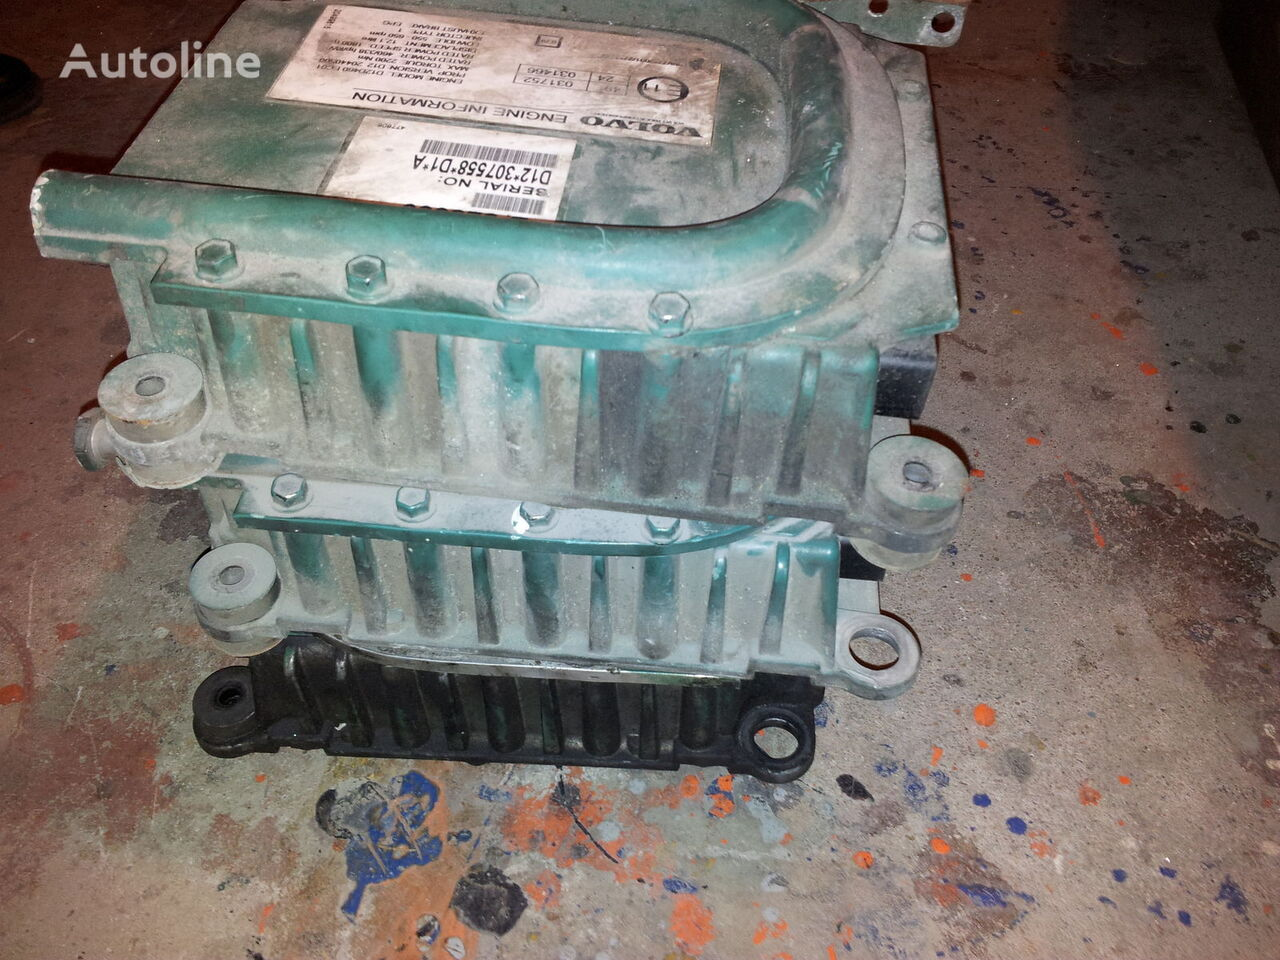 VOLVO FH12, EURO3 D12D ECU engine control unit 460PS; 420PS; 20440501; 20440500, 3161962, 20577131, 85107712, 85000086, 85000388, 20582958, 85111405, 85107712 control unit for VOLVO FH12 tractor unit